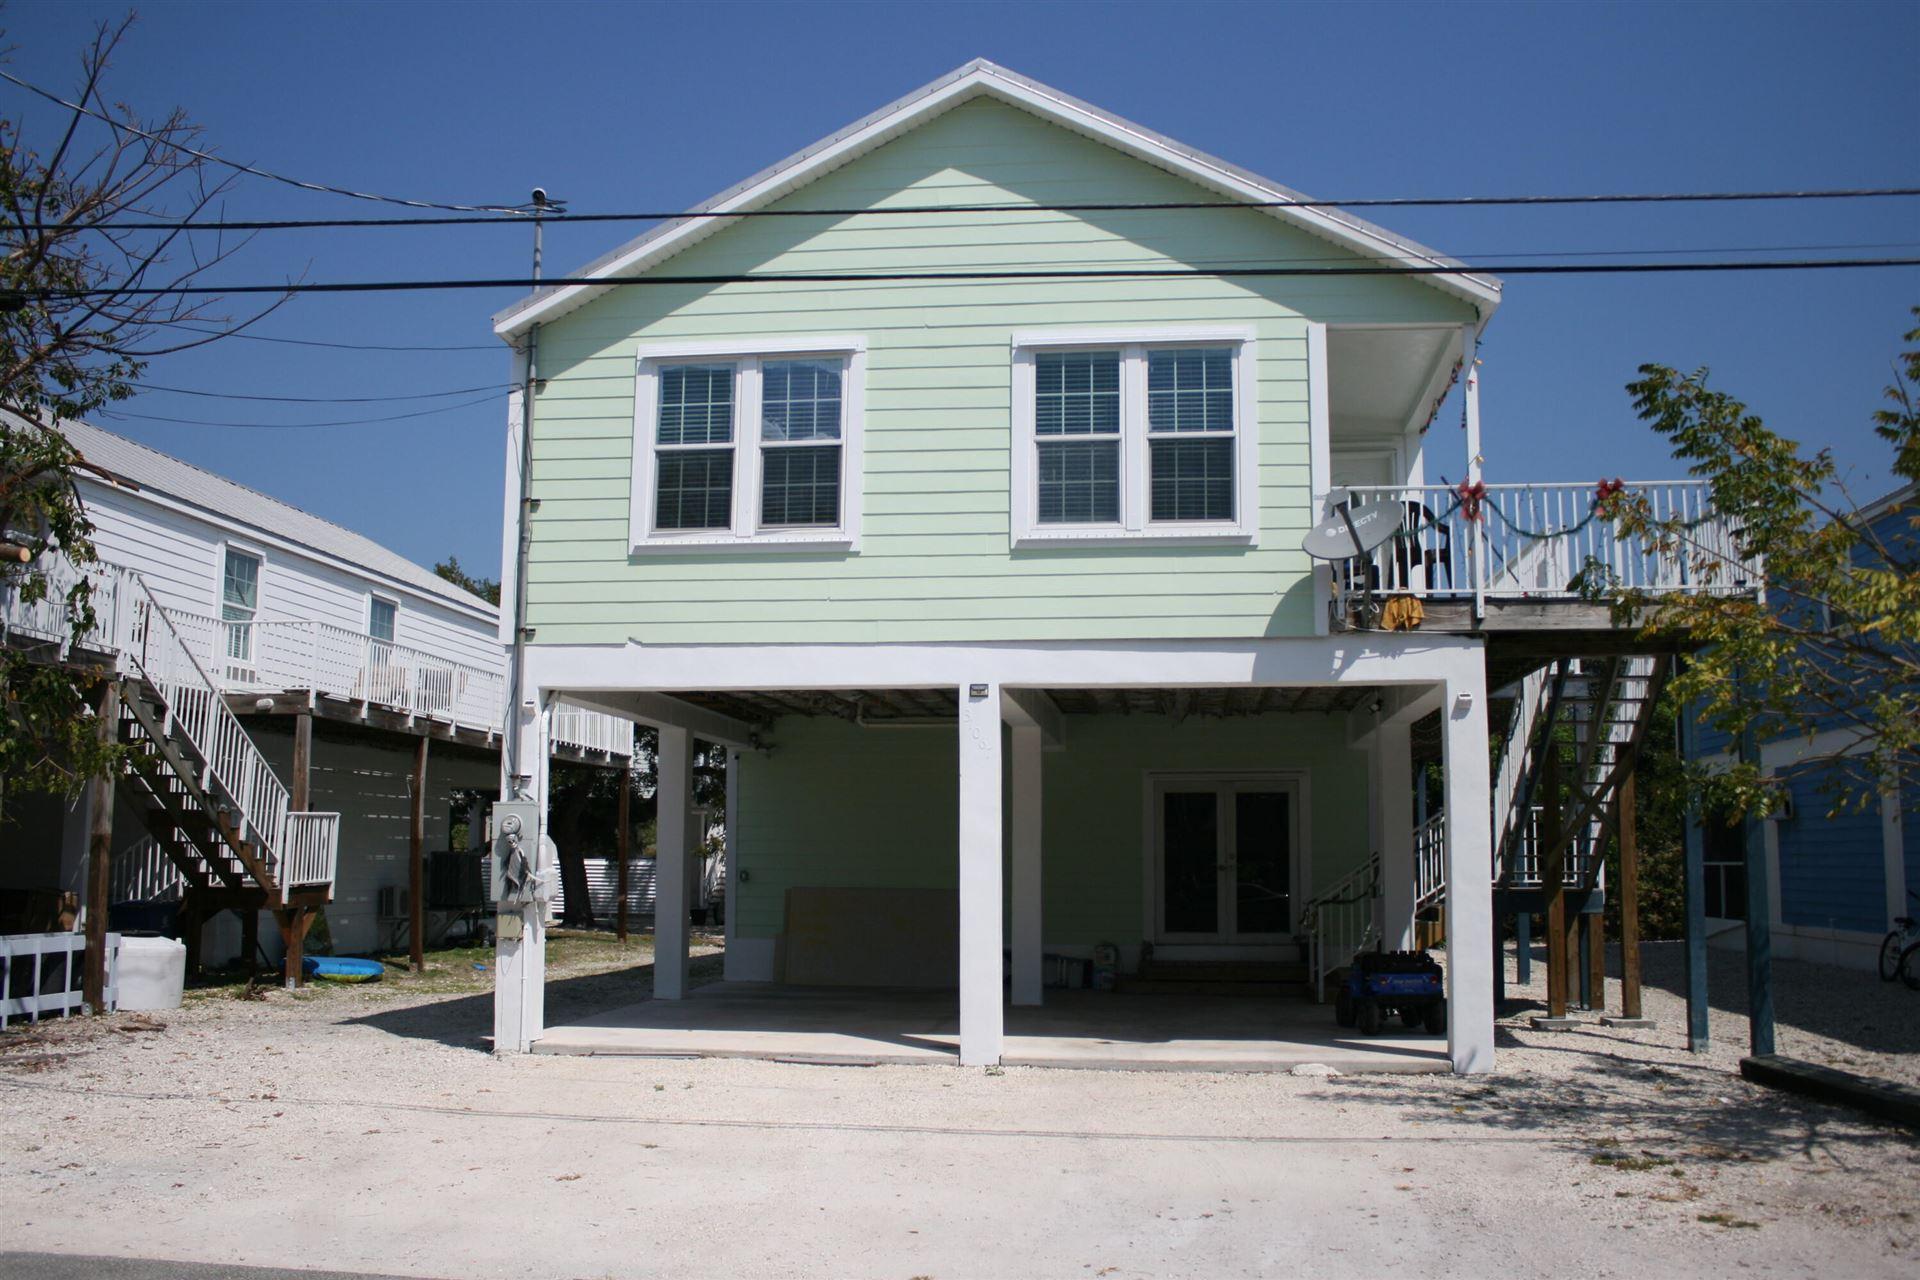 31067 Avenue C, Big Pine, FL 33043 - #: 595241